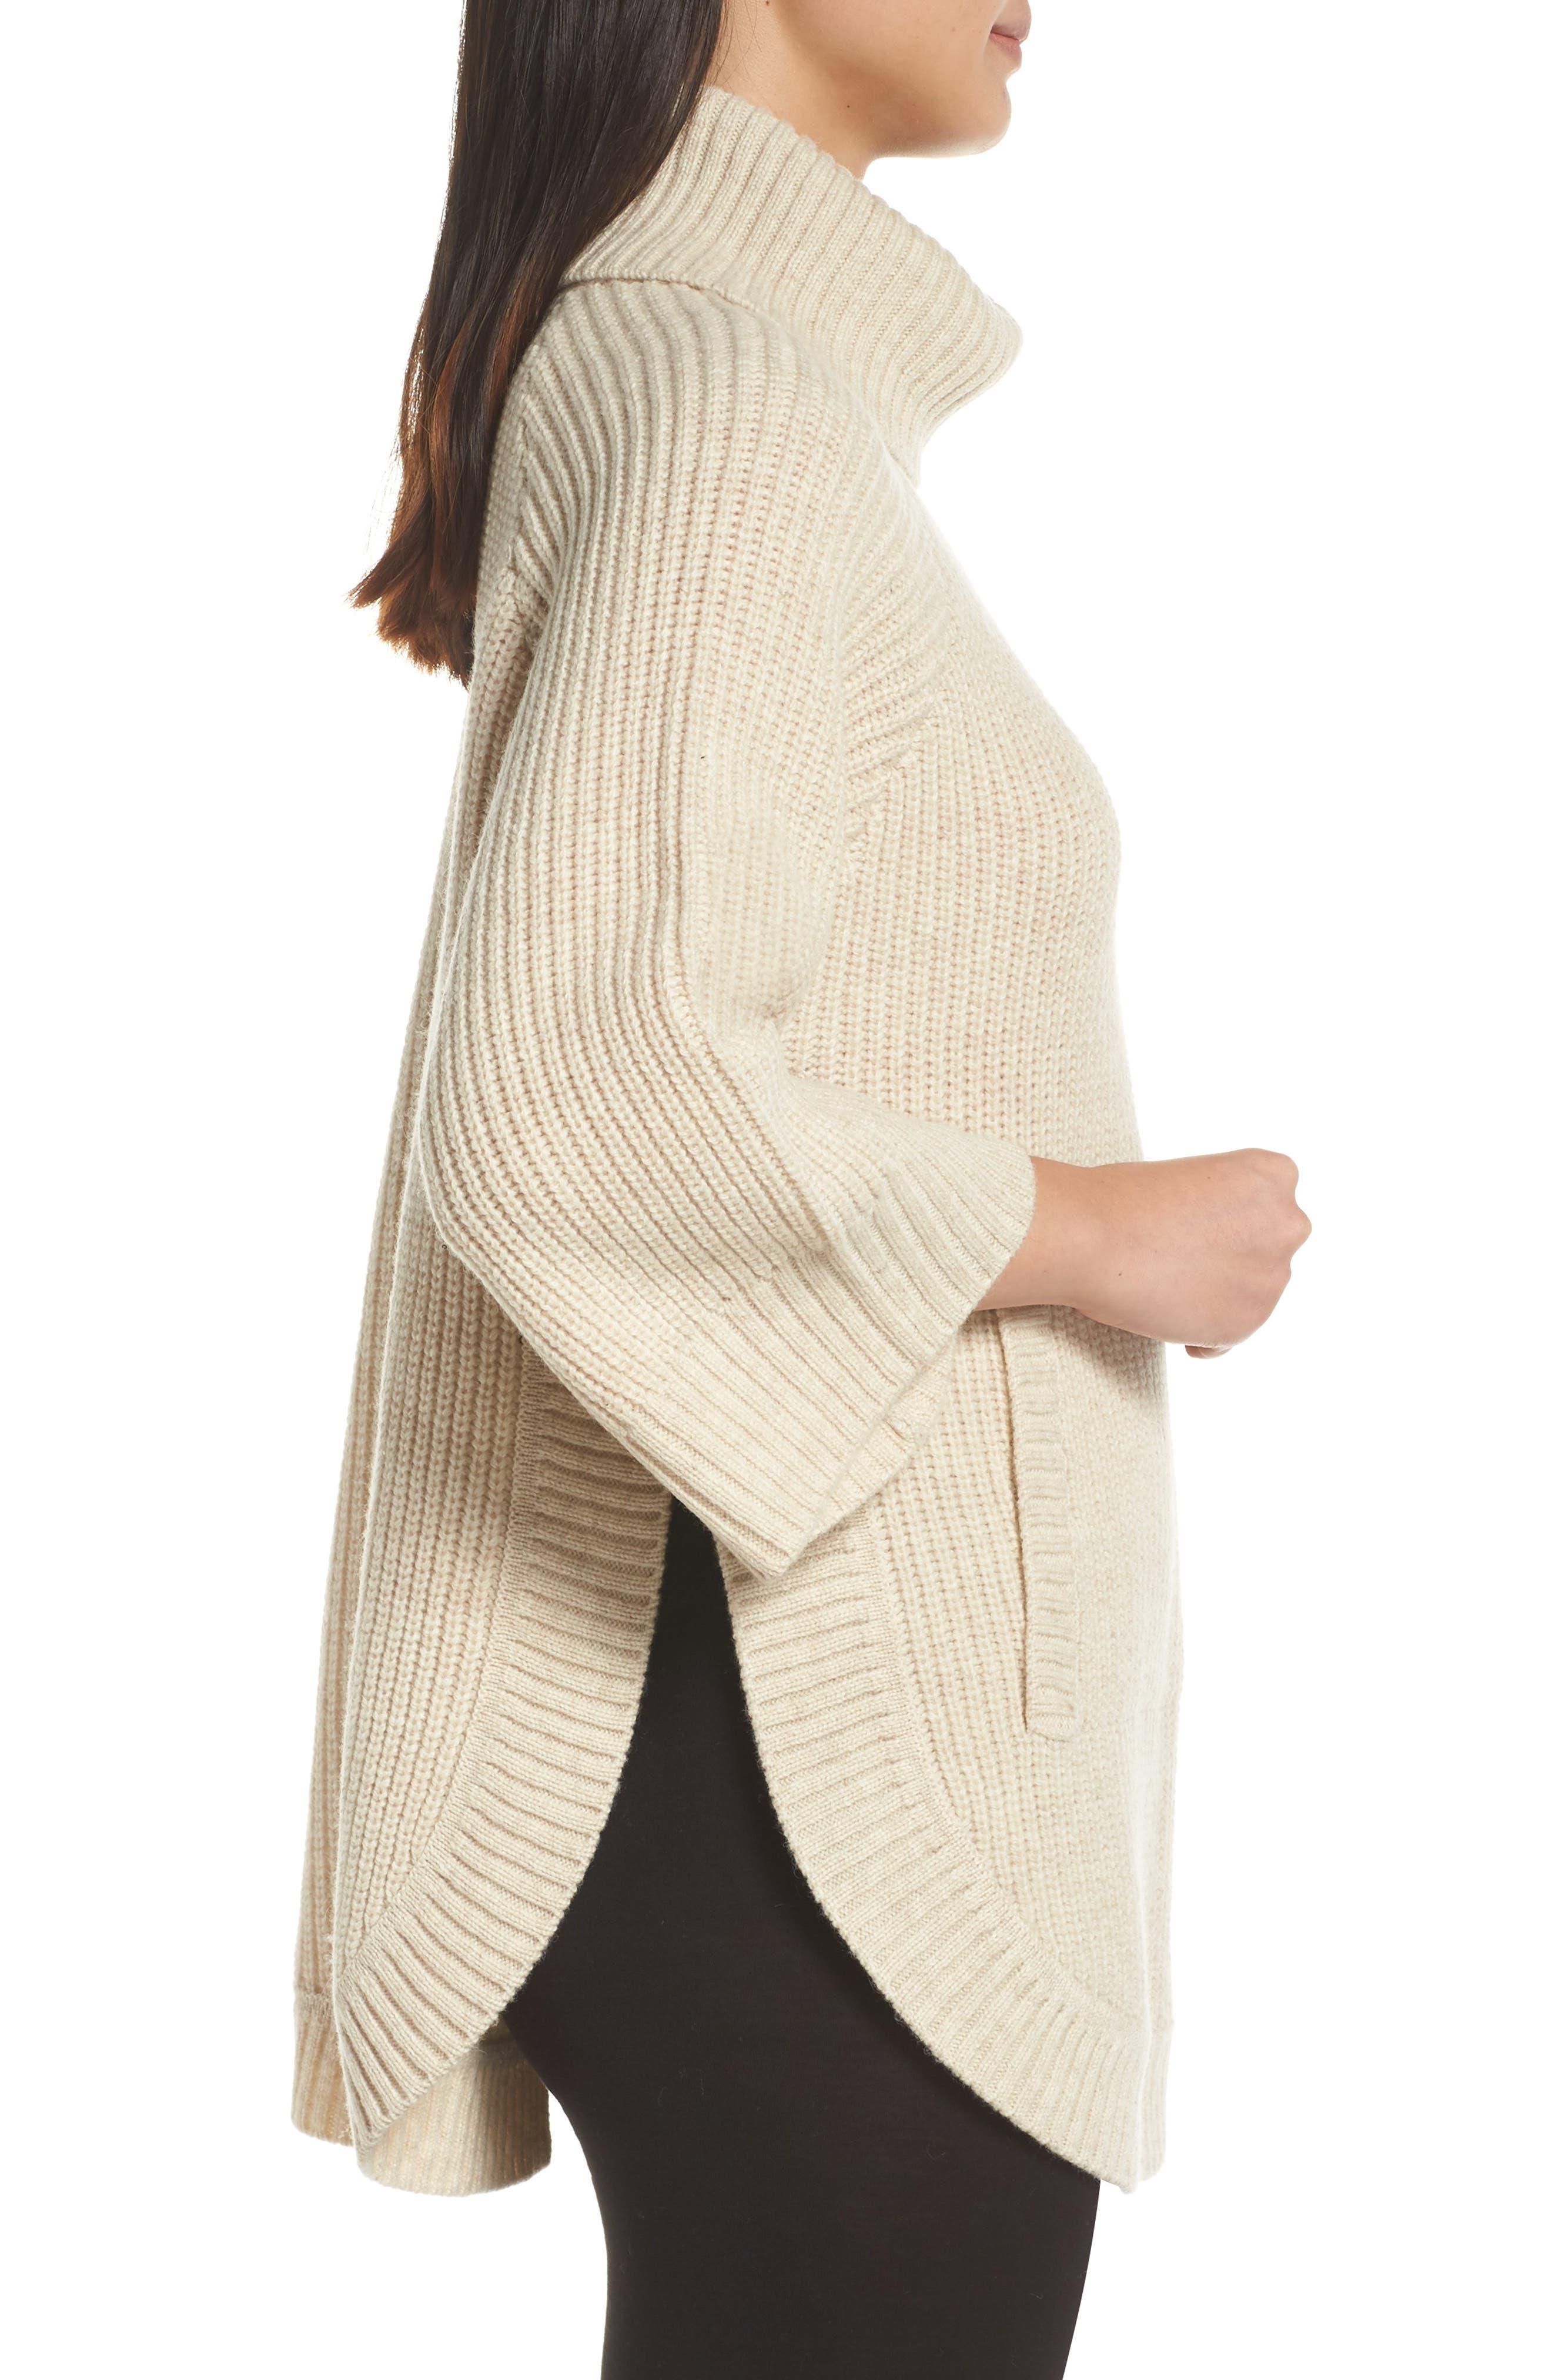 Raelynn Sweater Poncho,                             Alternate thumbnail 3, color,                             CREAM HEATHER